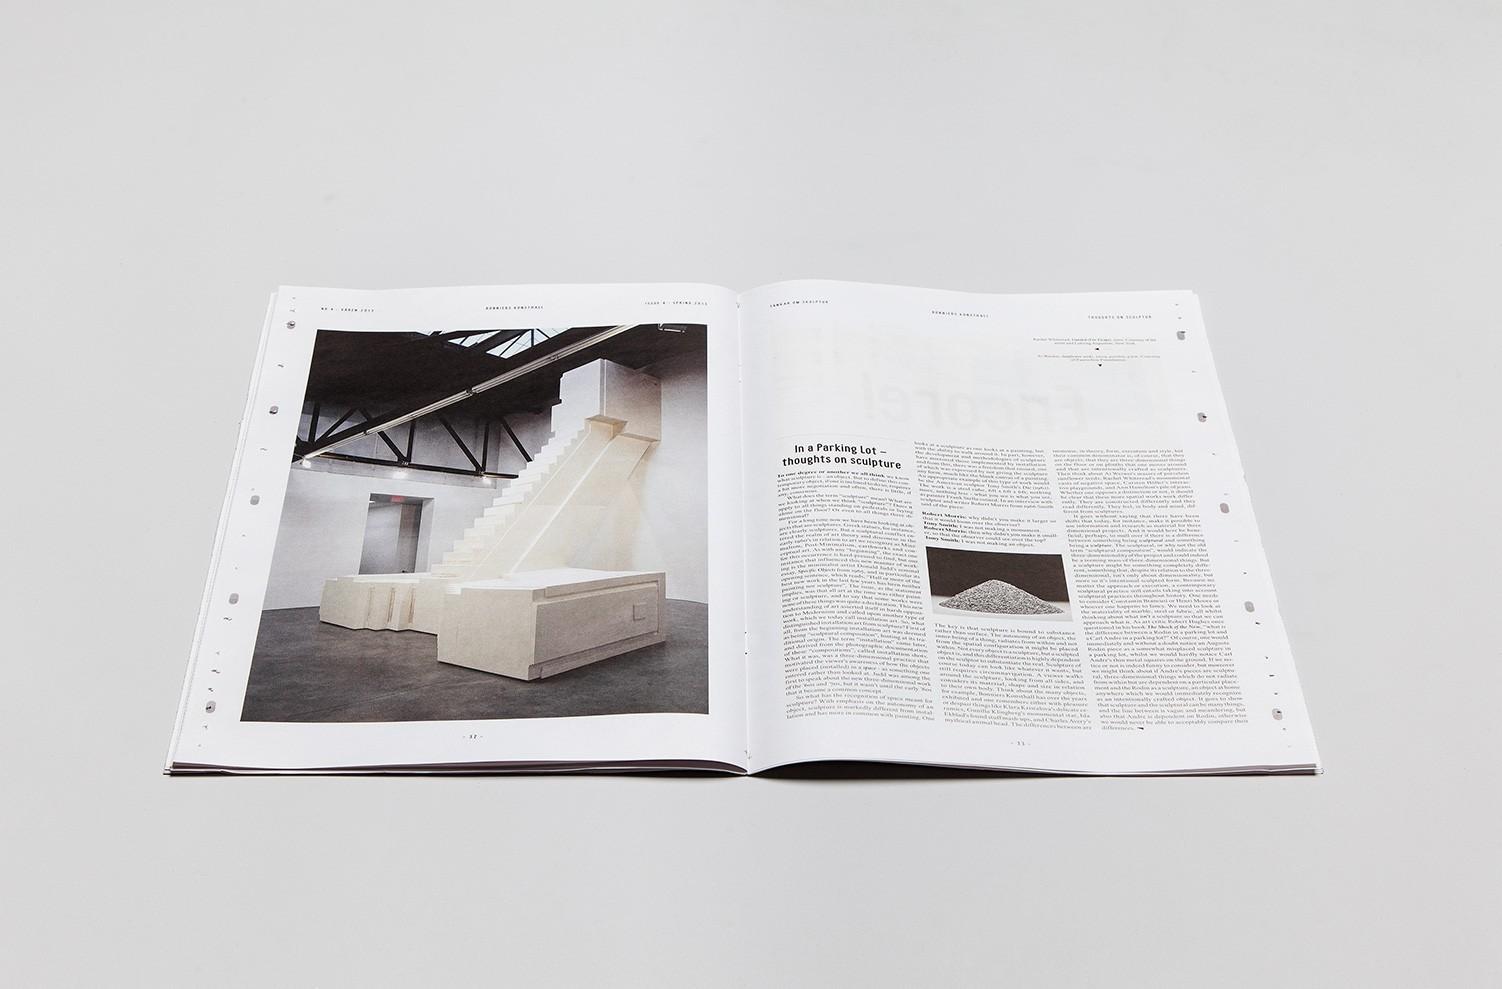 ritator_bonniers_konsthall_magazine_6